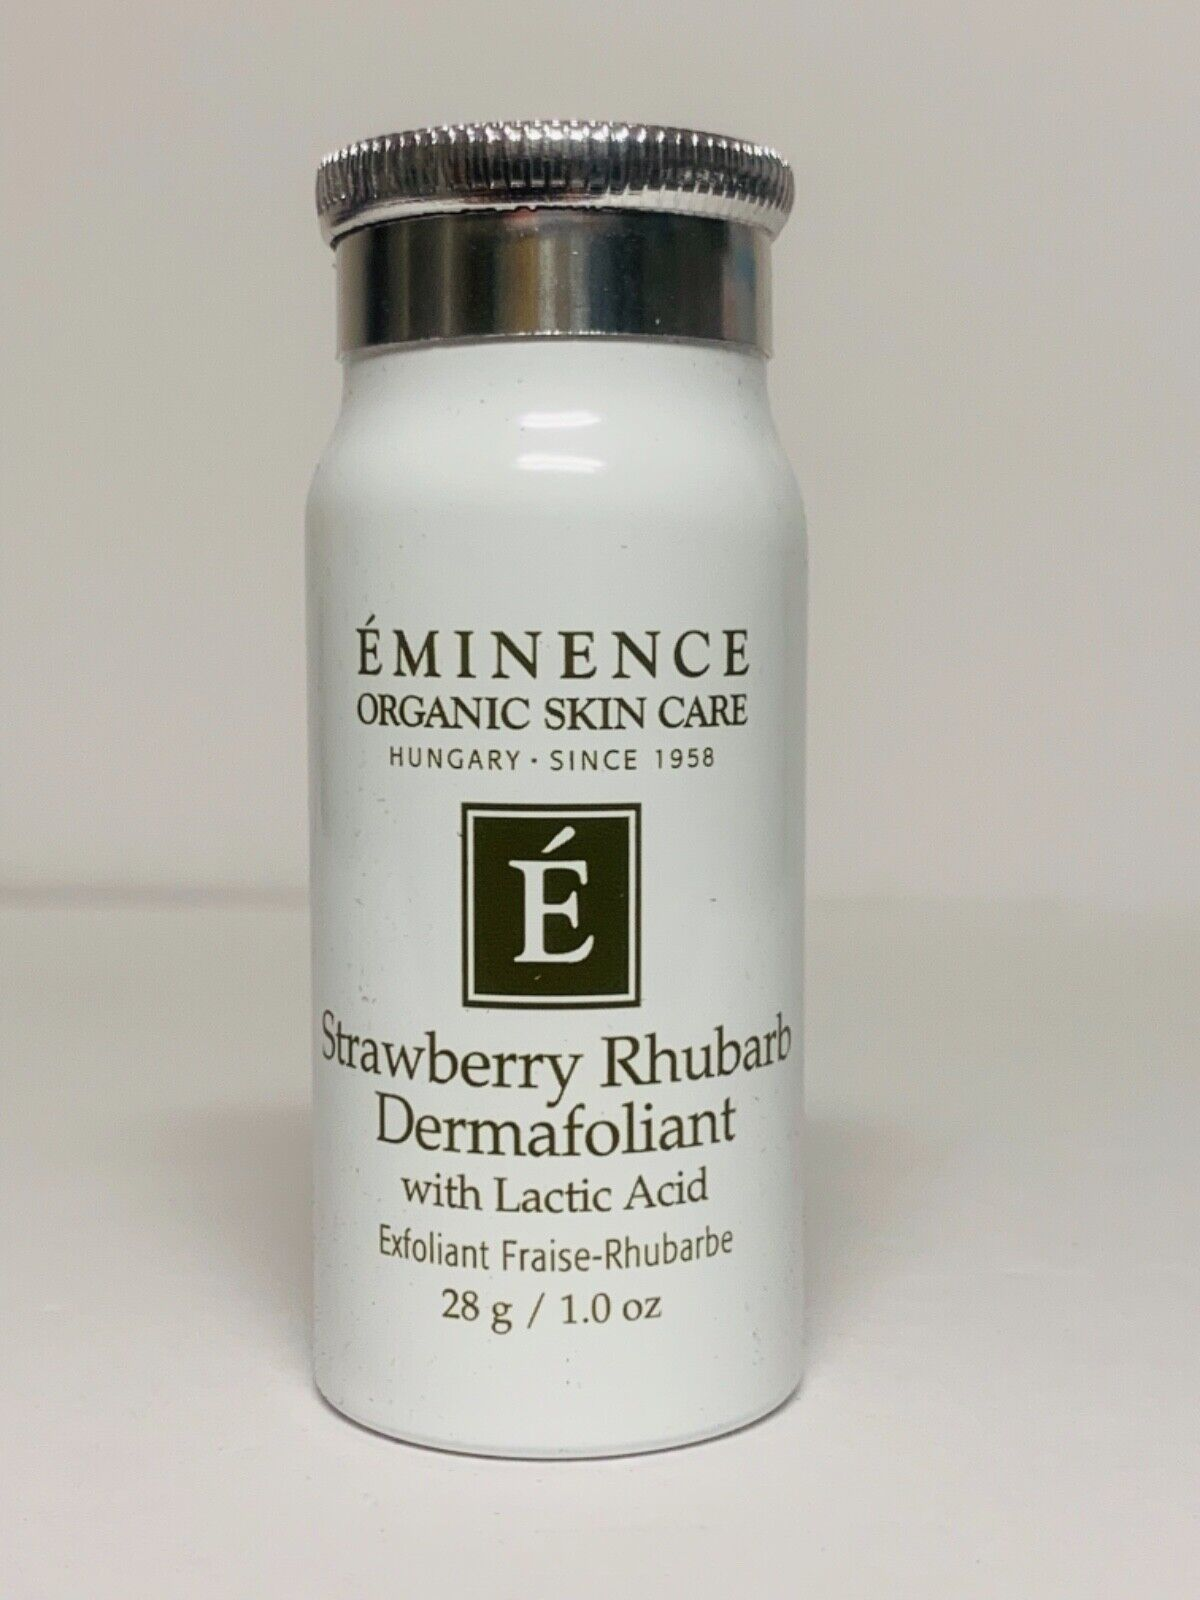 Eminence Organic Skin Care Strawberry Rhubarb Dermafoliant 28g/1 oz Travel Size 2